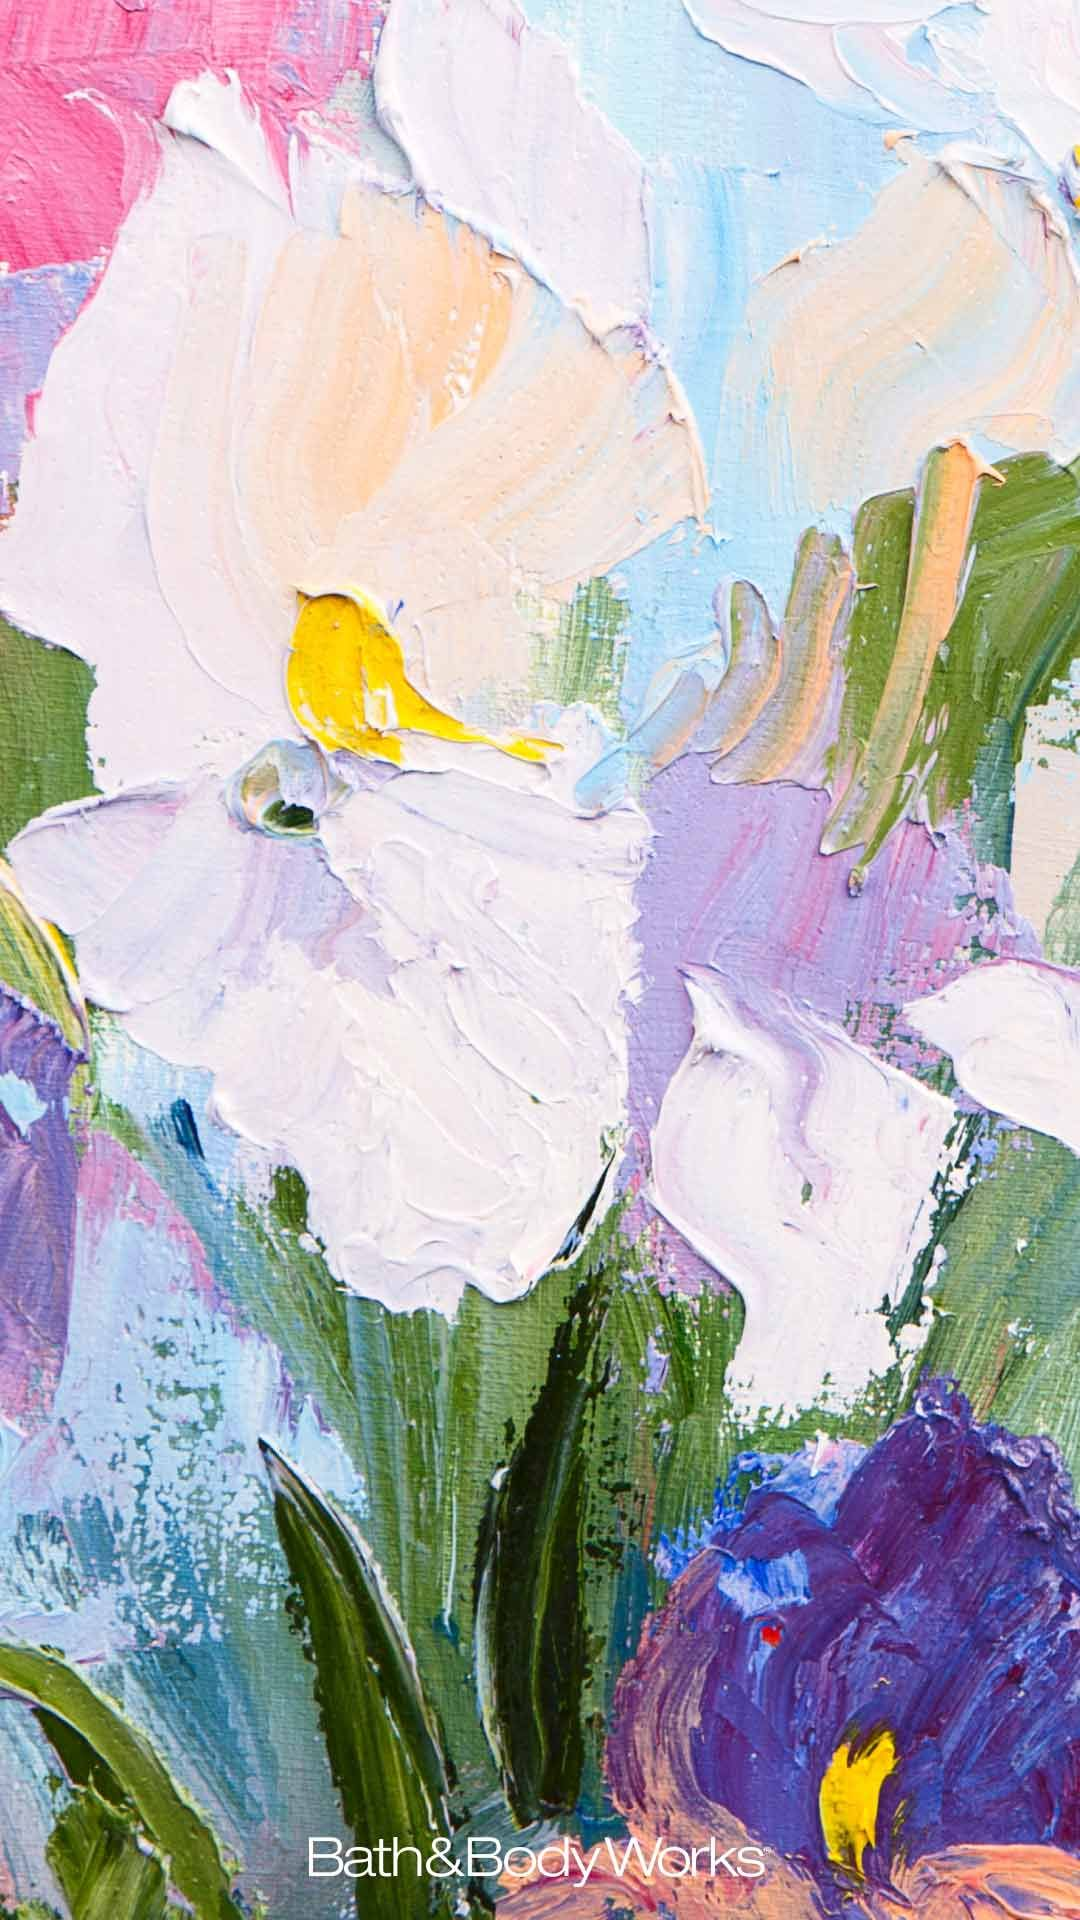 Http Www Bathandbodyworks Com On Demandware Static Sites Bathandbodyworks Library Default Dw Watercolor Wallpaper Iphone Floral Watercolor Iphone Wallpaper